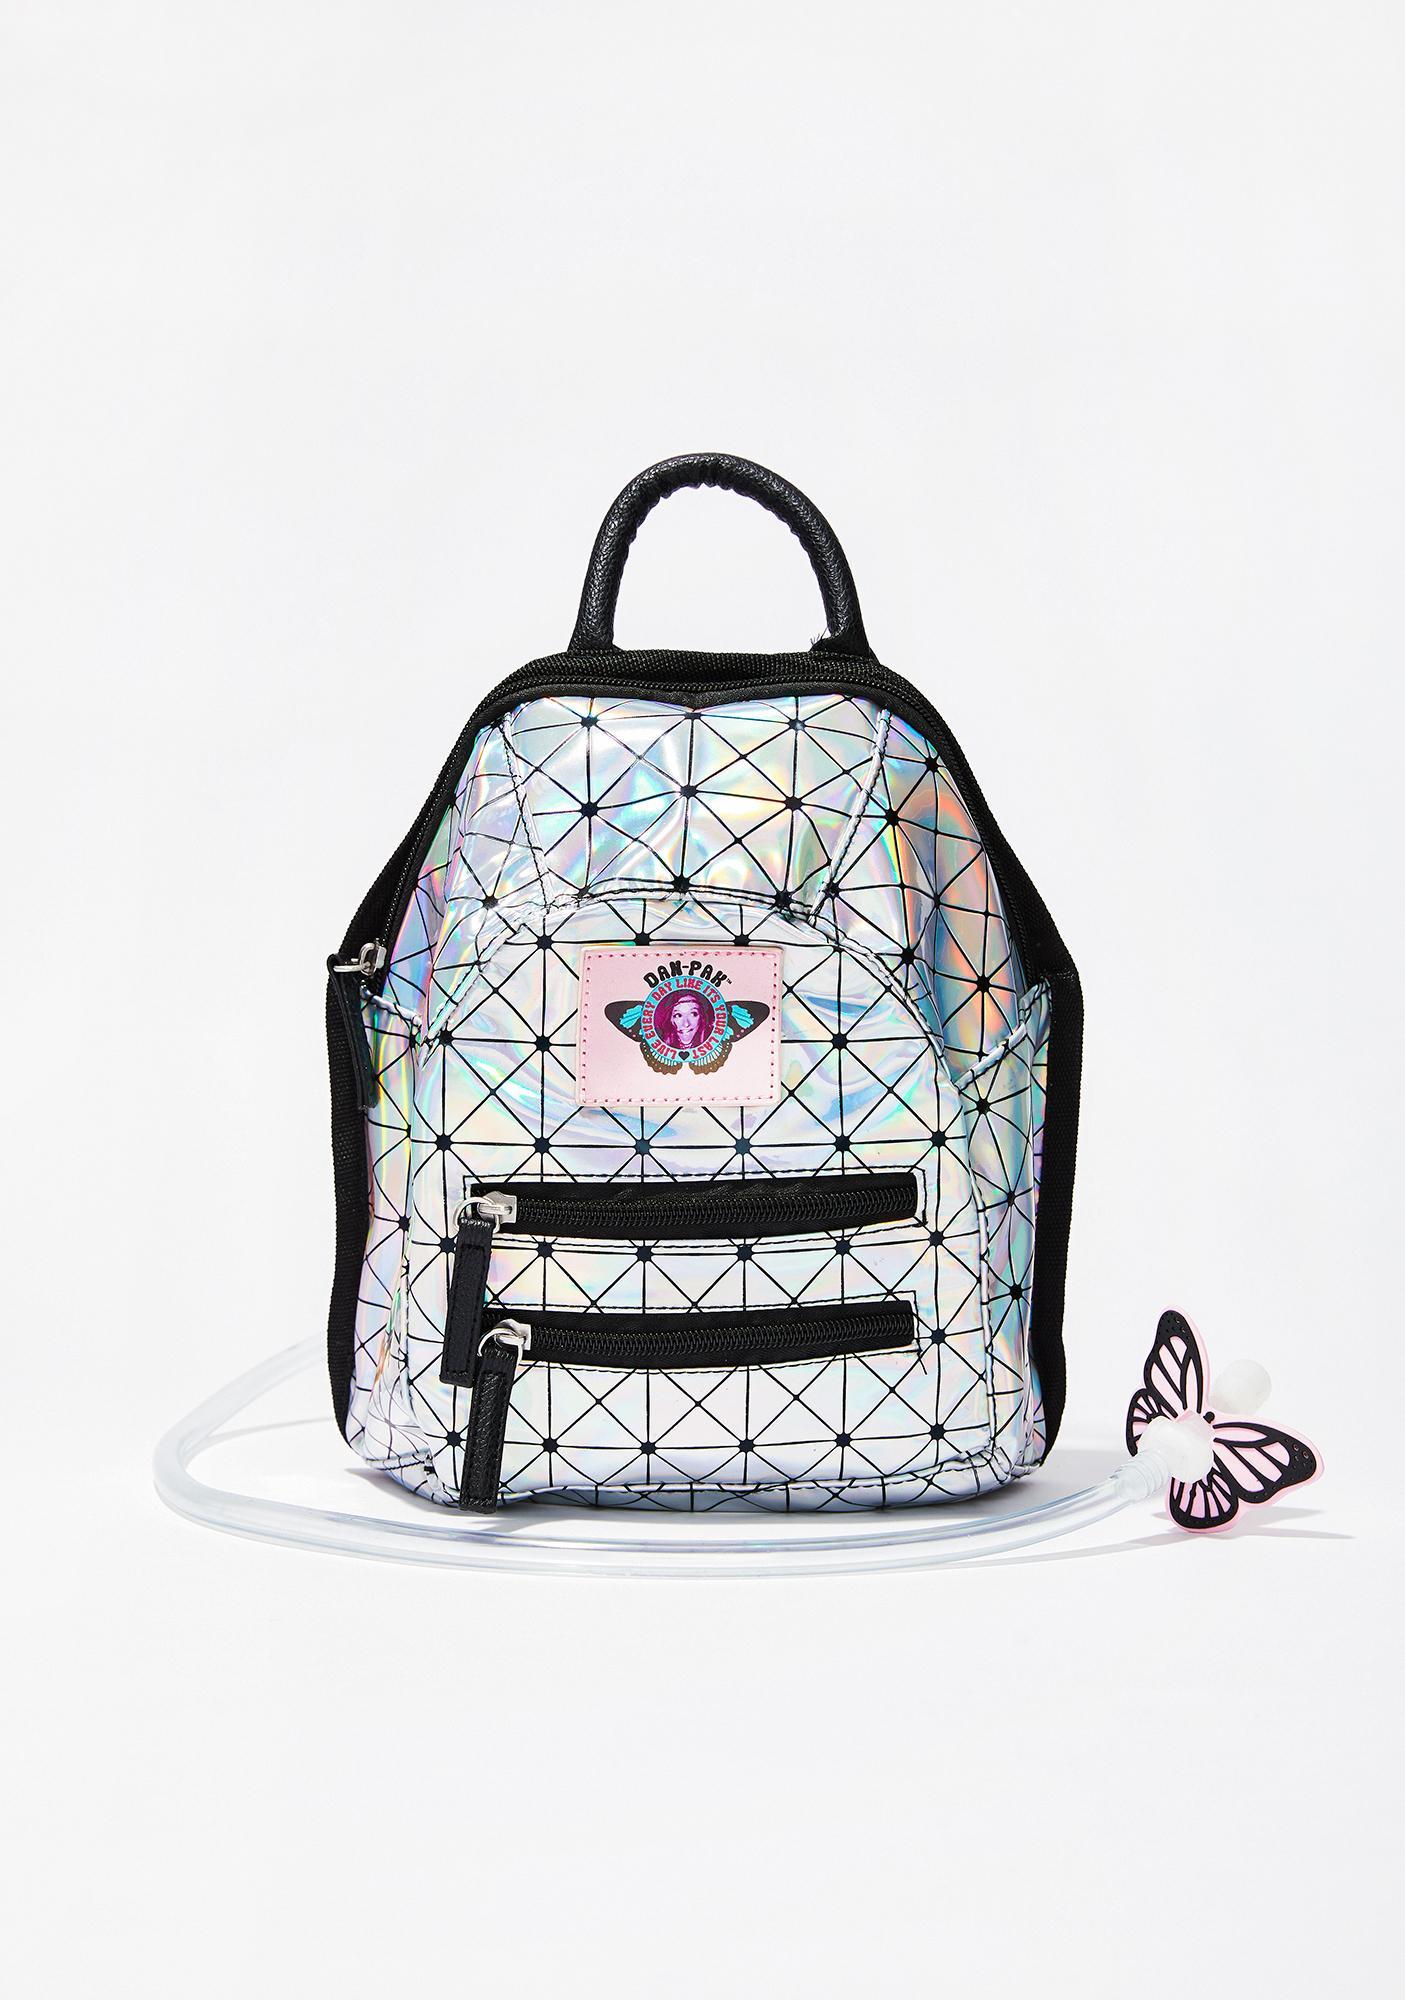 Dan-Pak Holographic Disco Mini Hydration Backpack